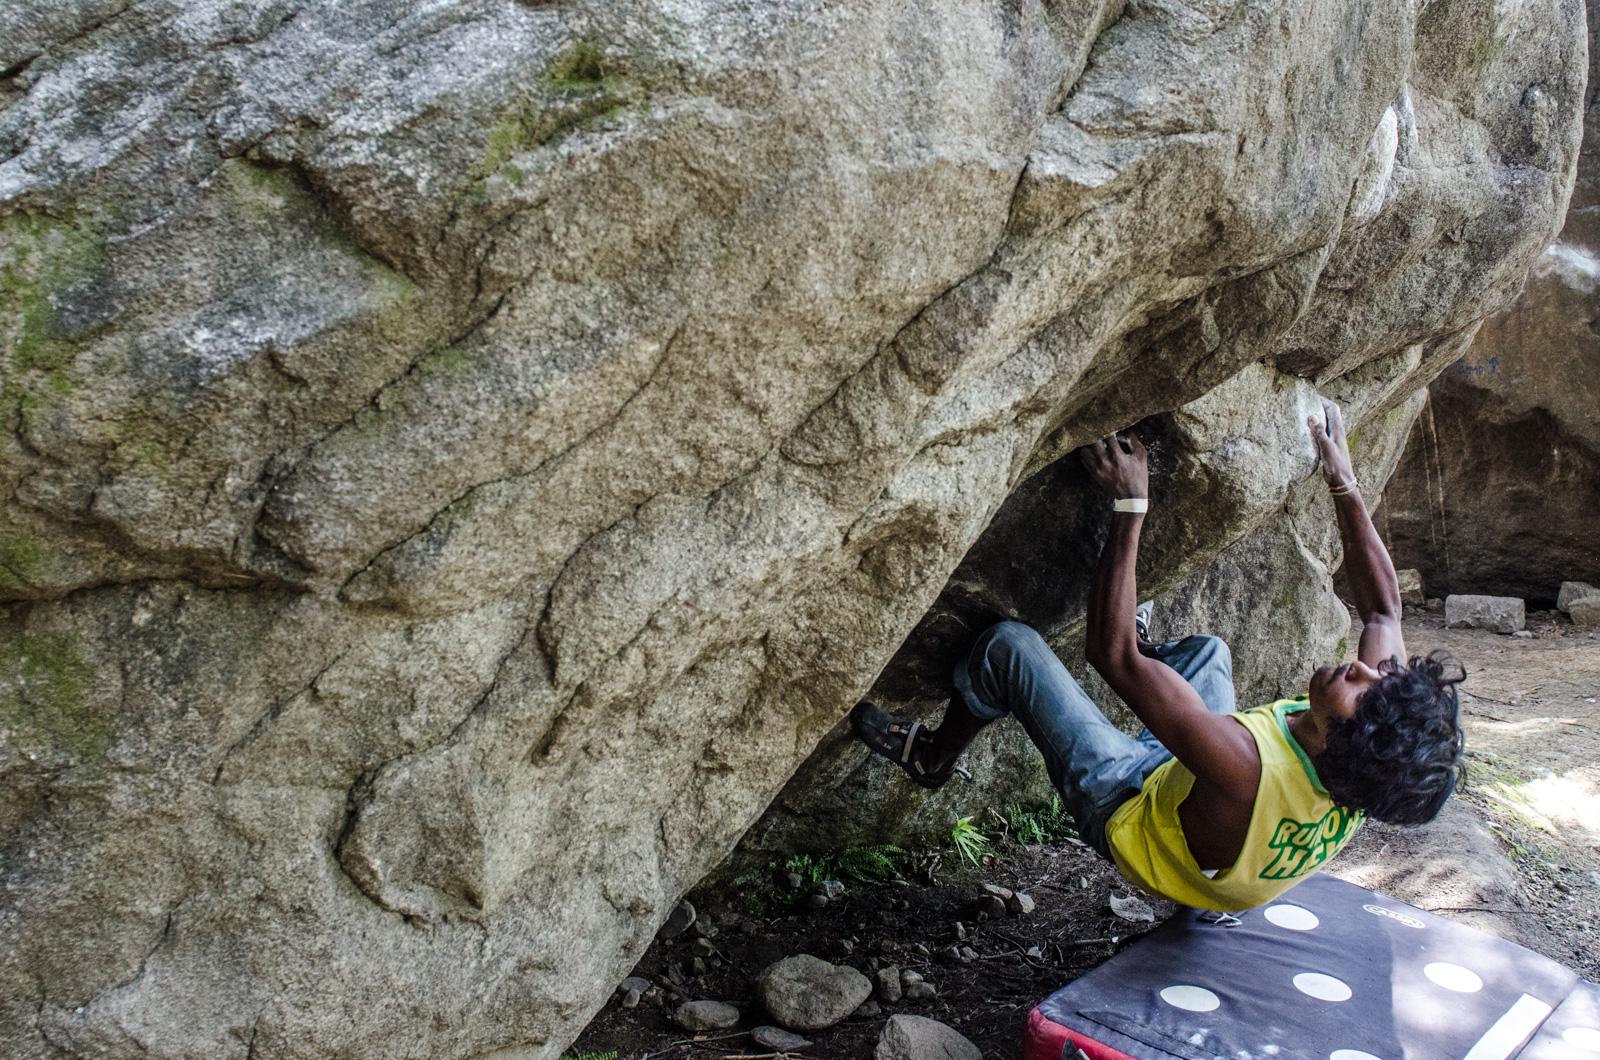 Manali-HimachalPradesh-Bouldering-RockClimbing-AmyRolloPhoto-2874.jpg